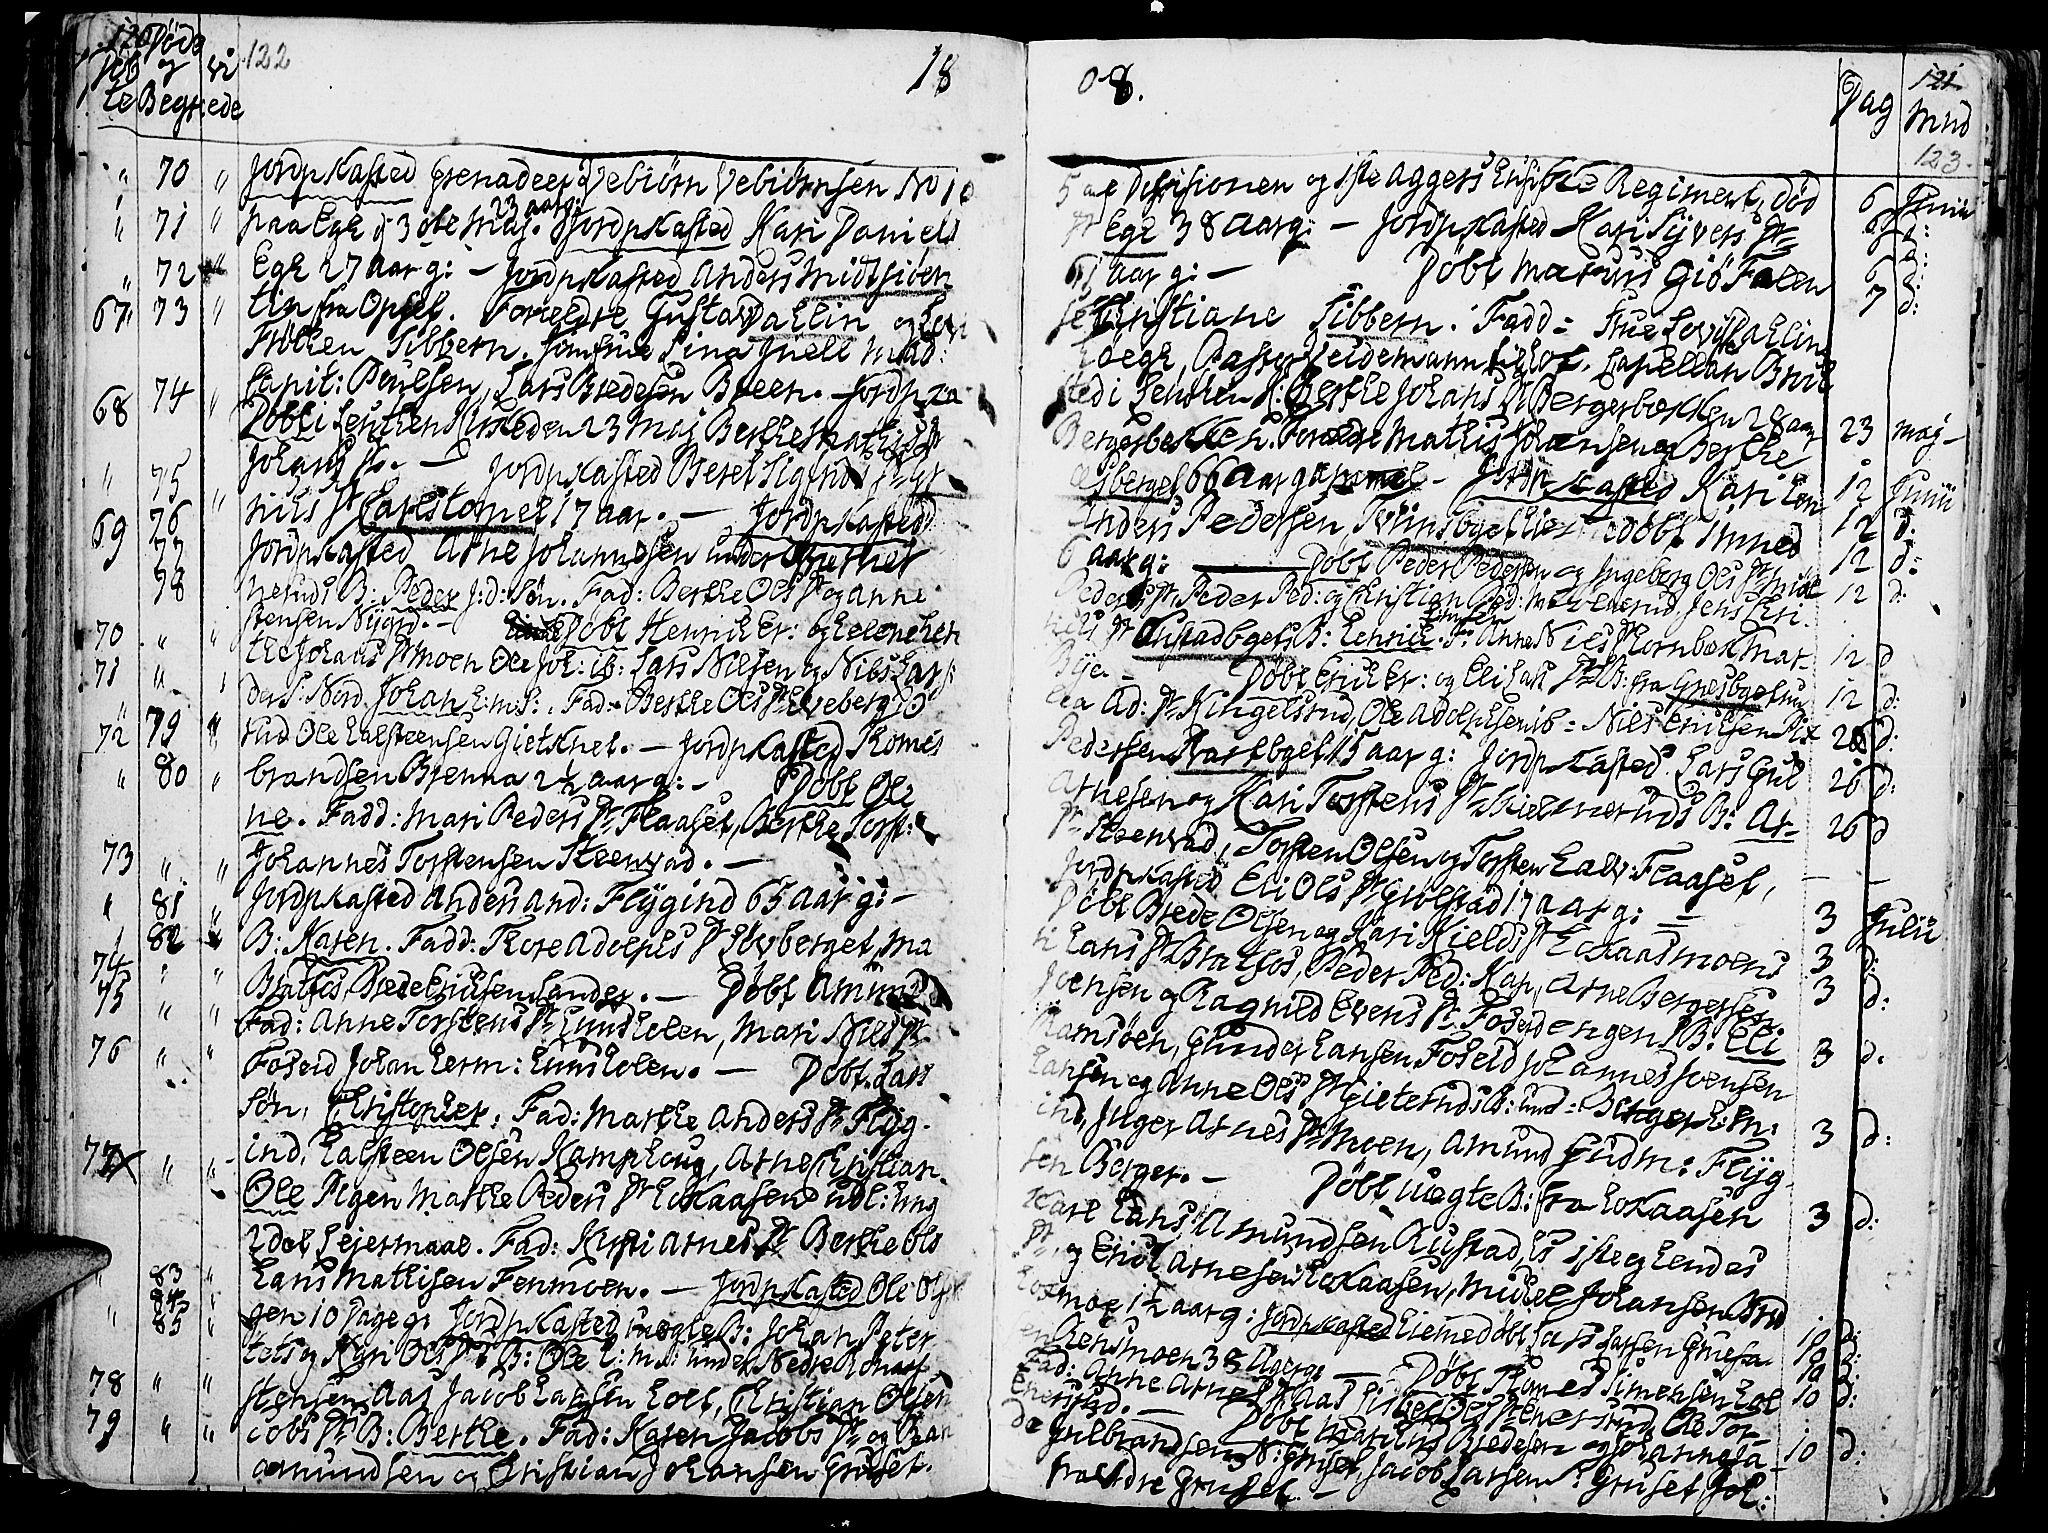 SAH, Grue prestekontor, Ministerialbok nr. 5, 1805-1814, s. 122-123